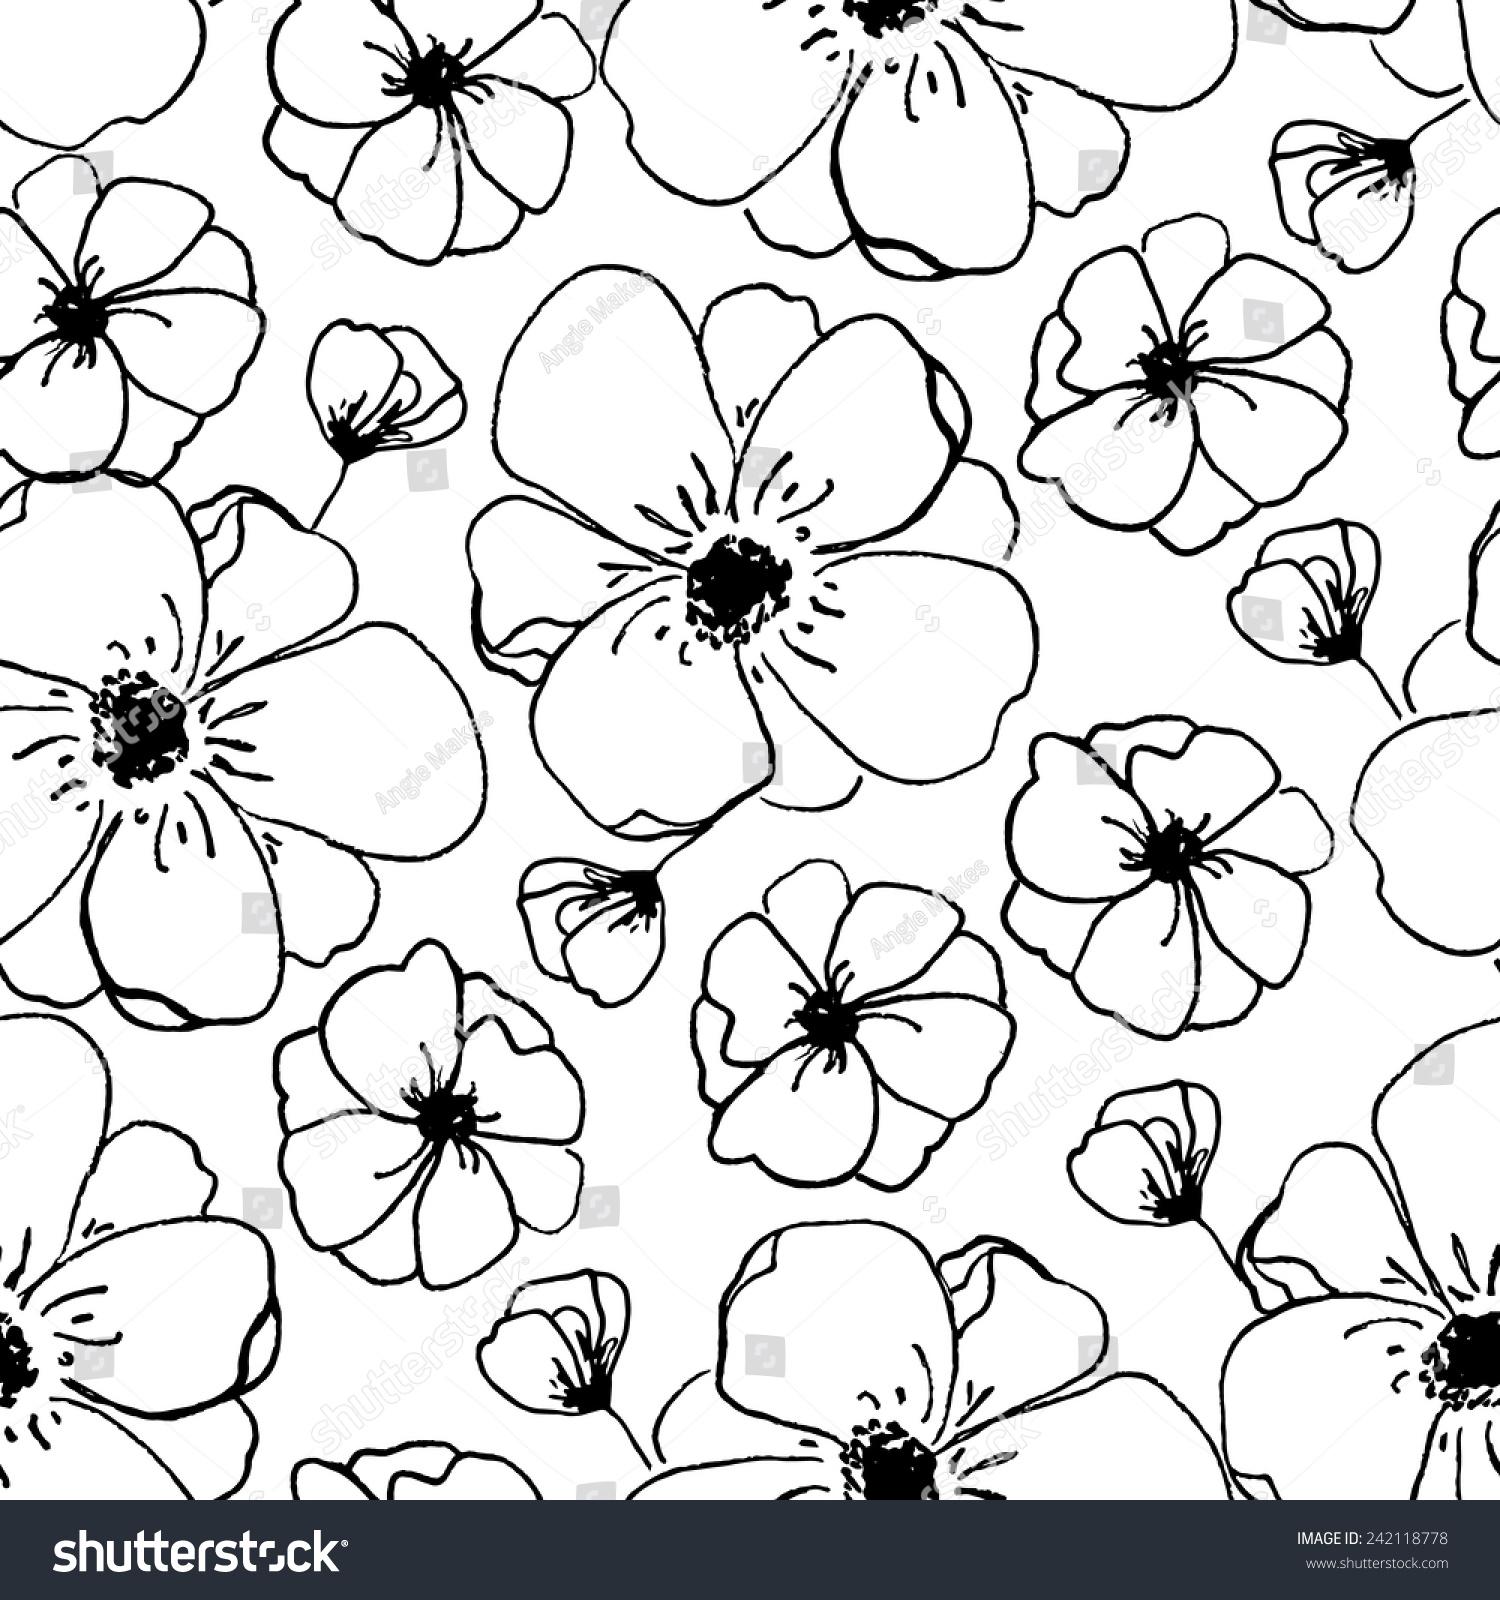 Modern black white floral pattern bloom stock vector for Modern patterns black and white